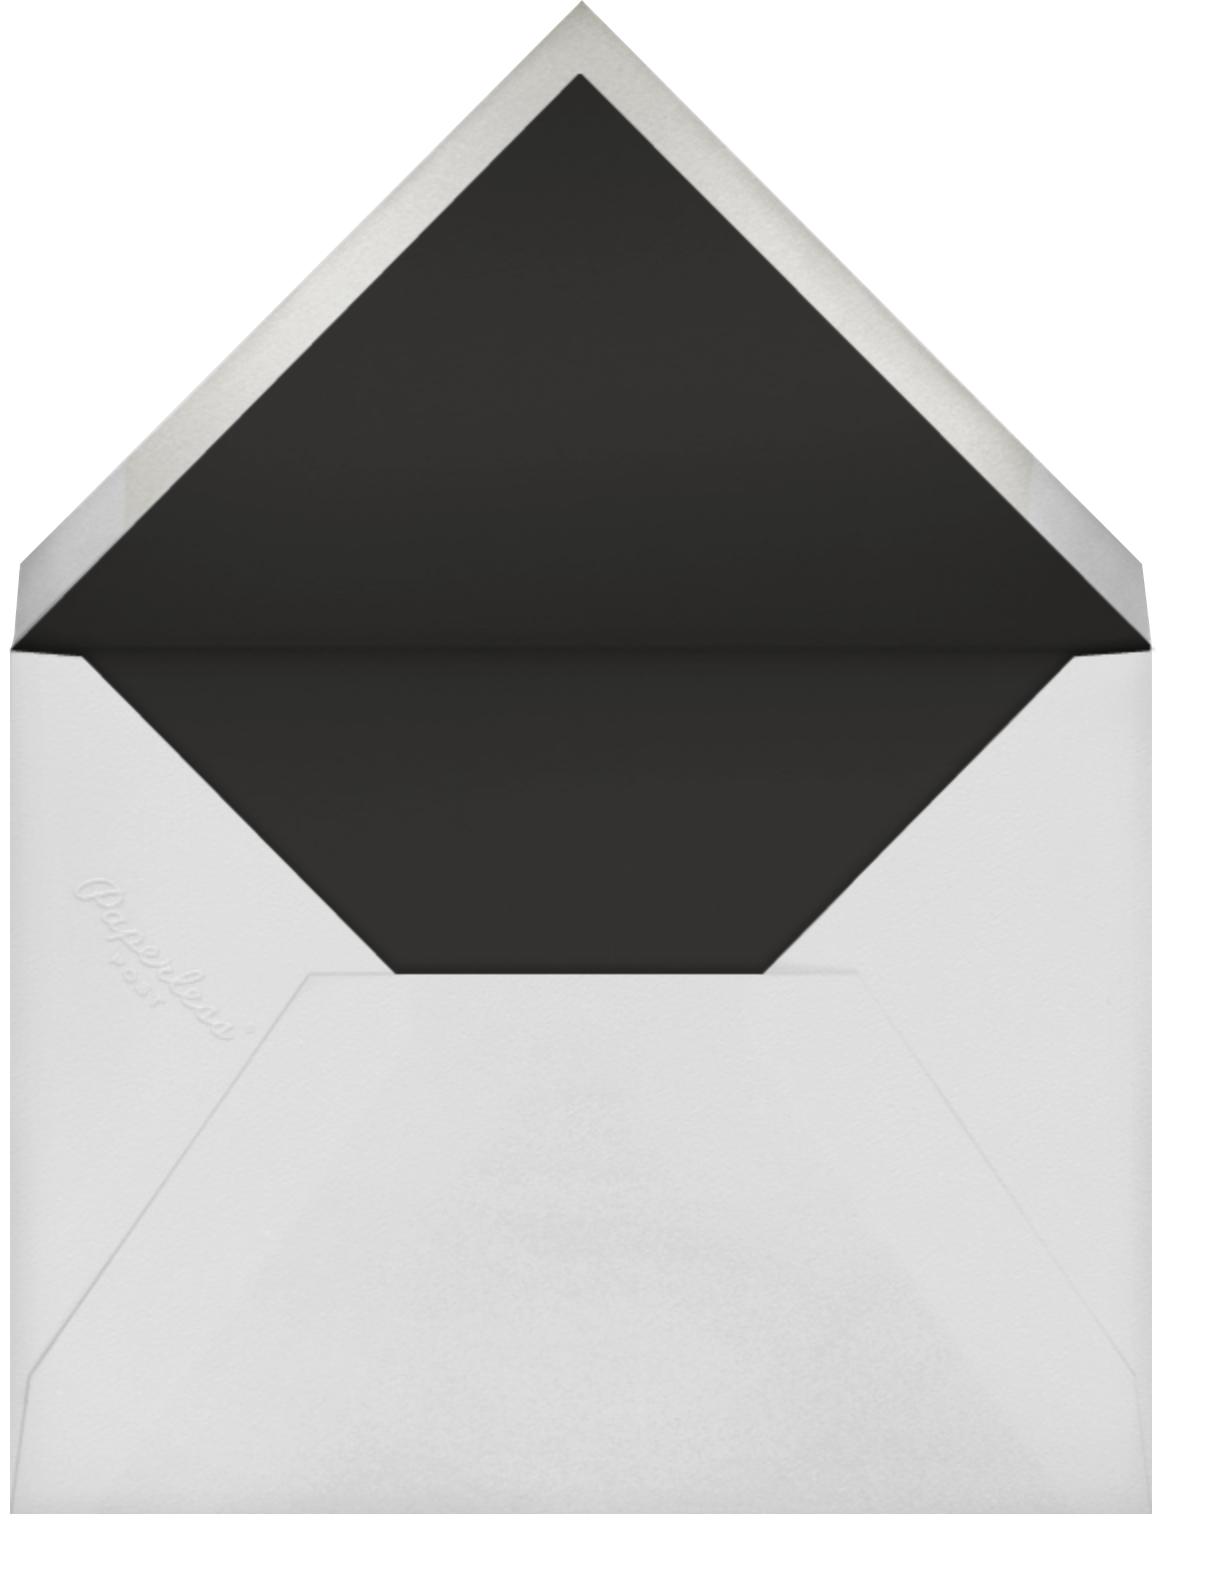 Memoir (Photo Save the Date) - Black - Paperless Post - Photo  - envelope back